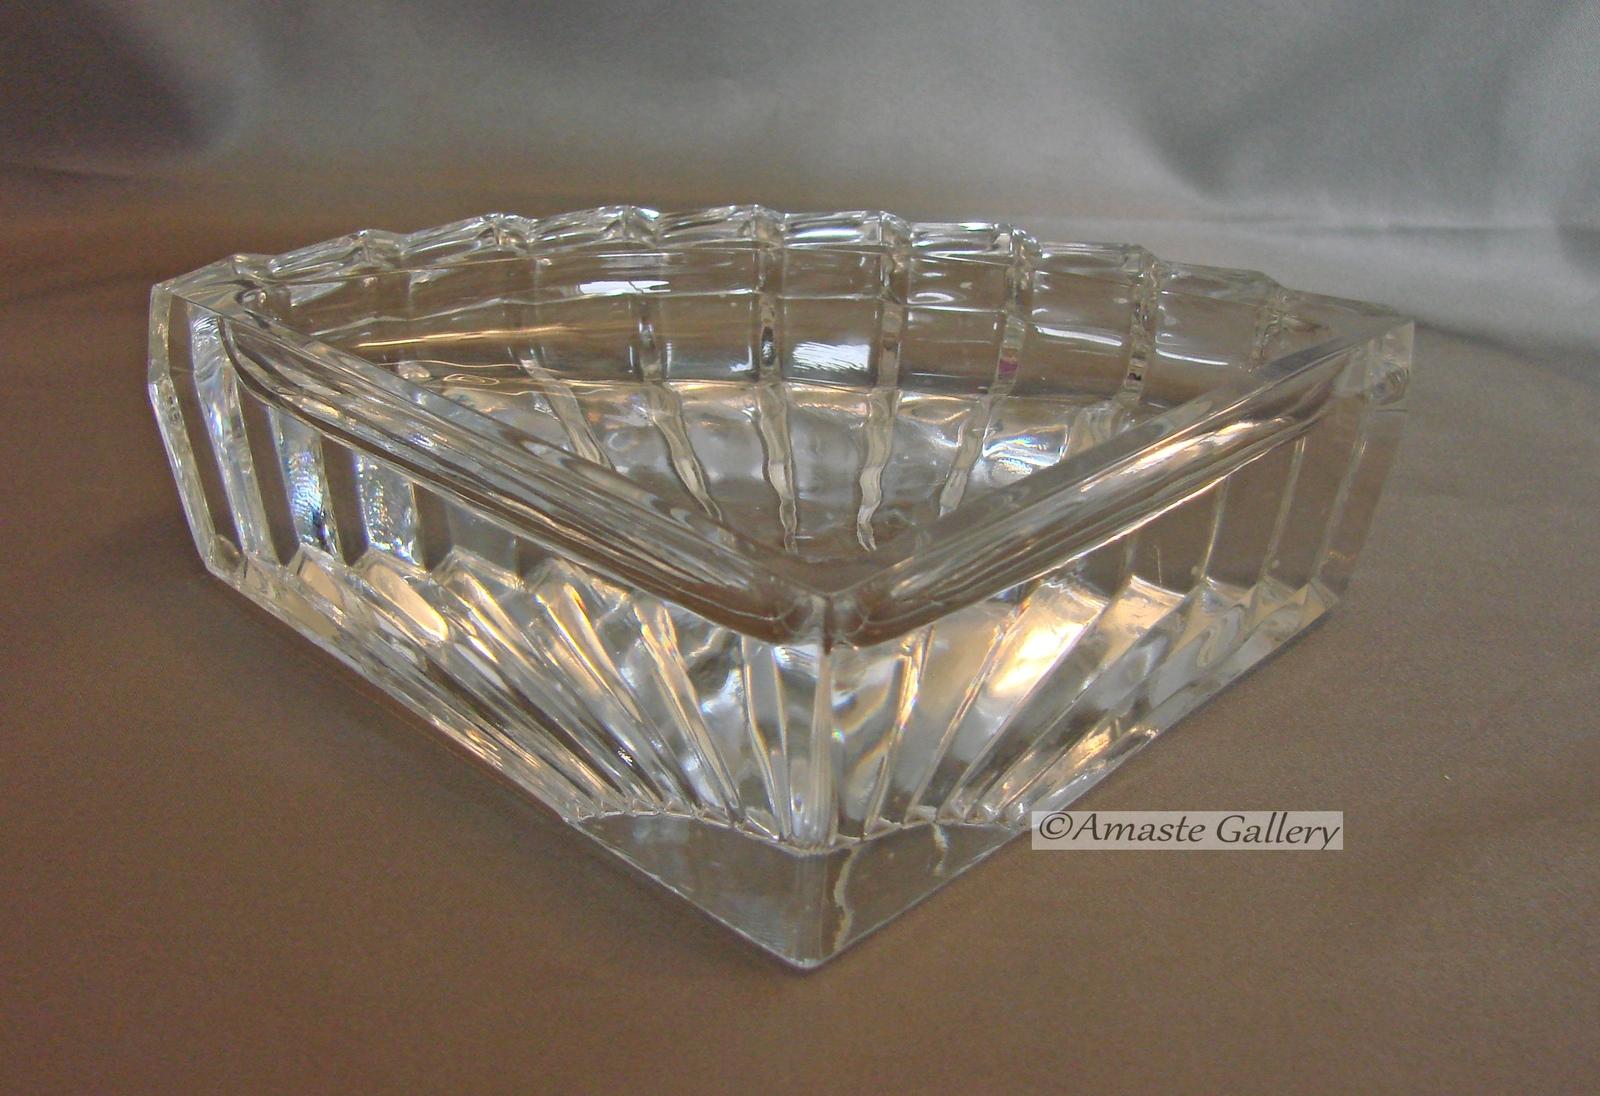 Cristal Darques France Genuine Lead Crystal Vase.Cristal D Arques Genuine Lead Crystal Fan And 25 Similar Items